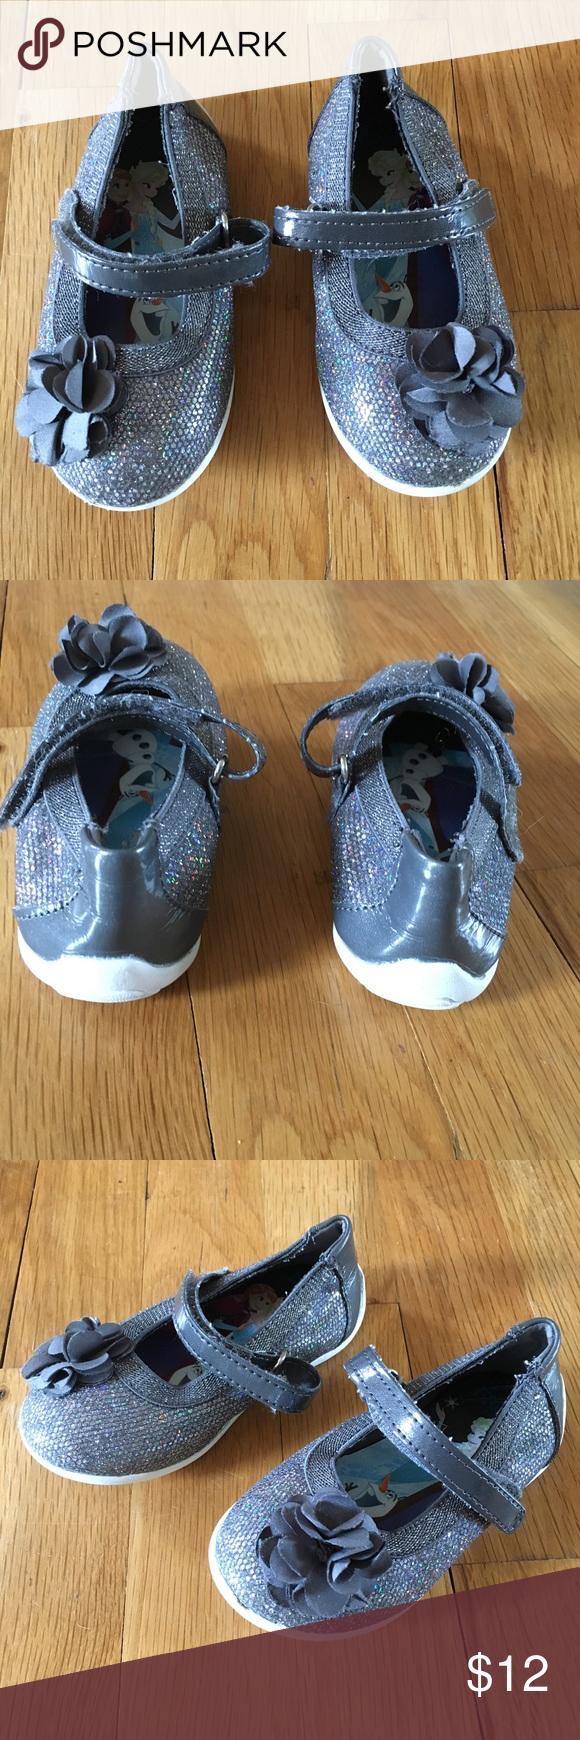 💕🍀Disney Frozen Girl shoe 🍀💕